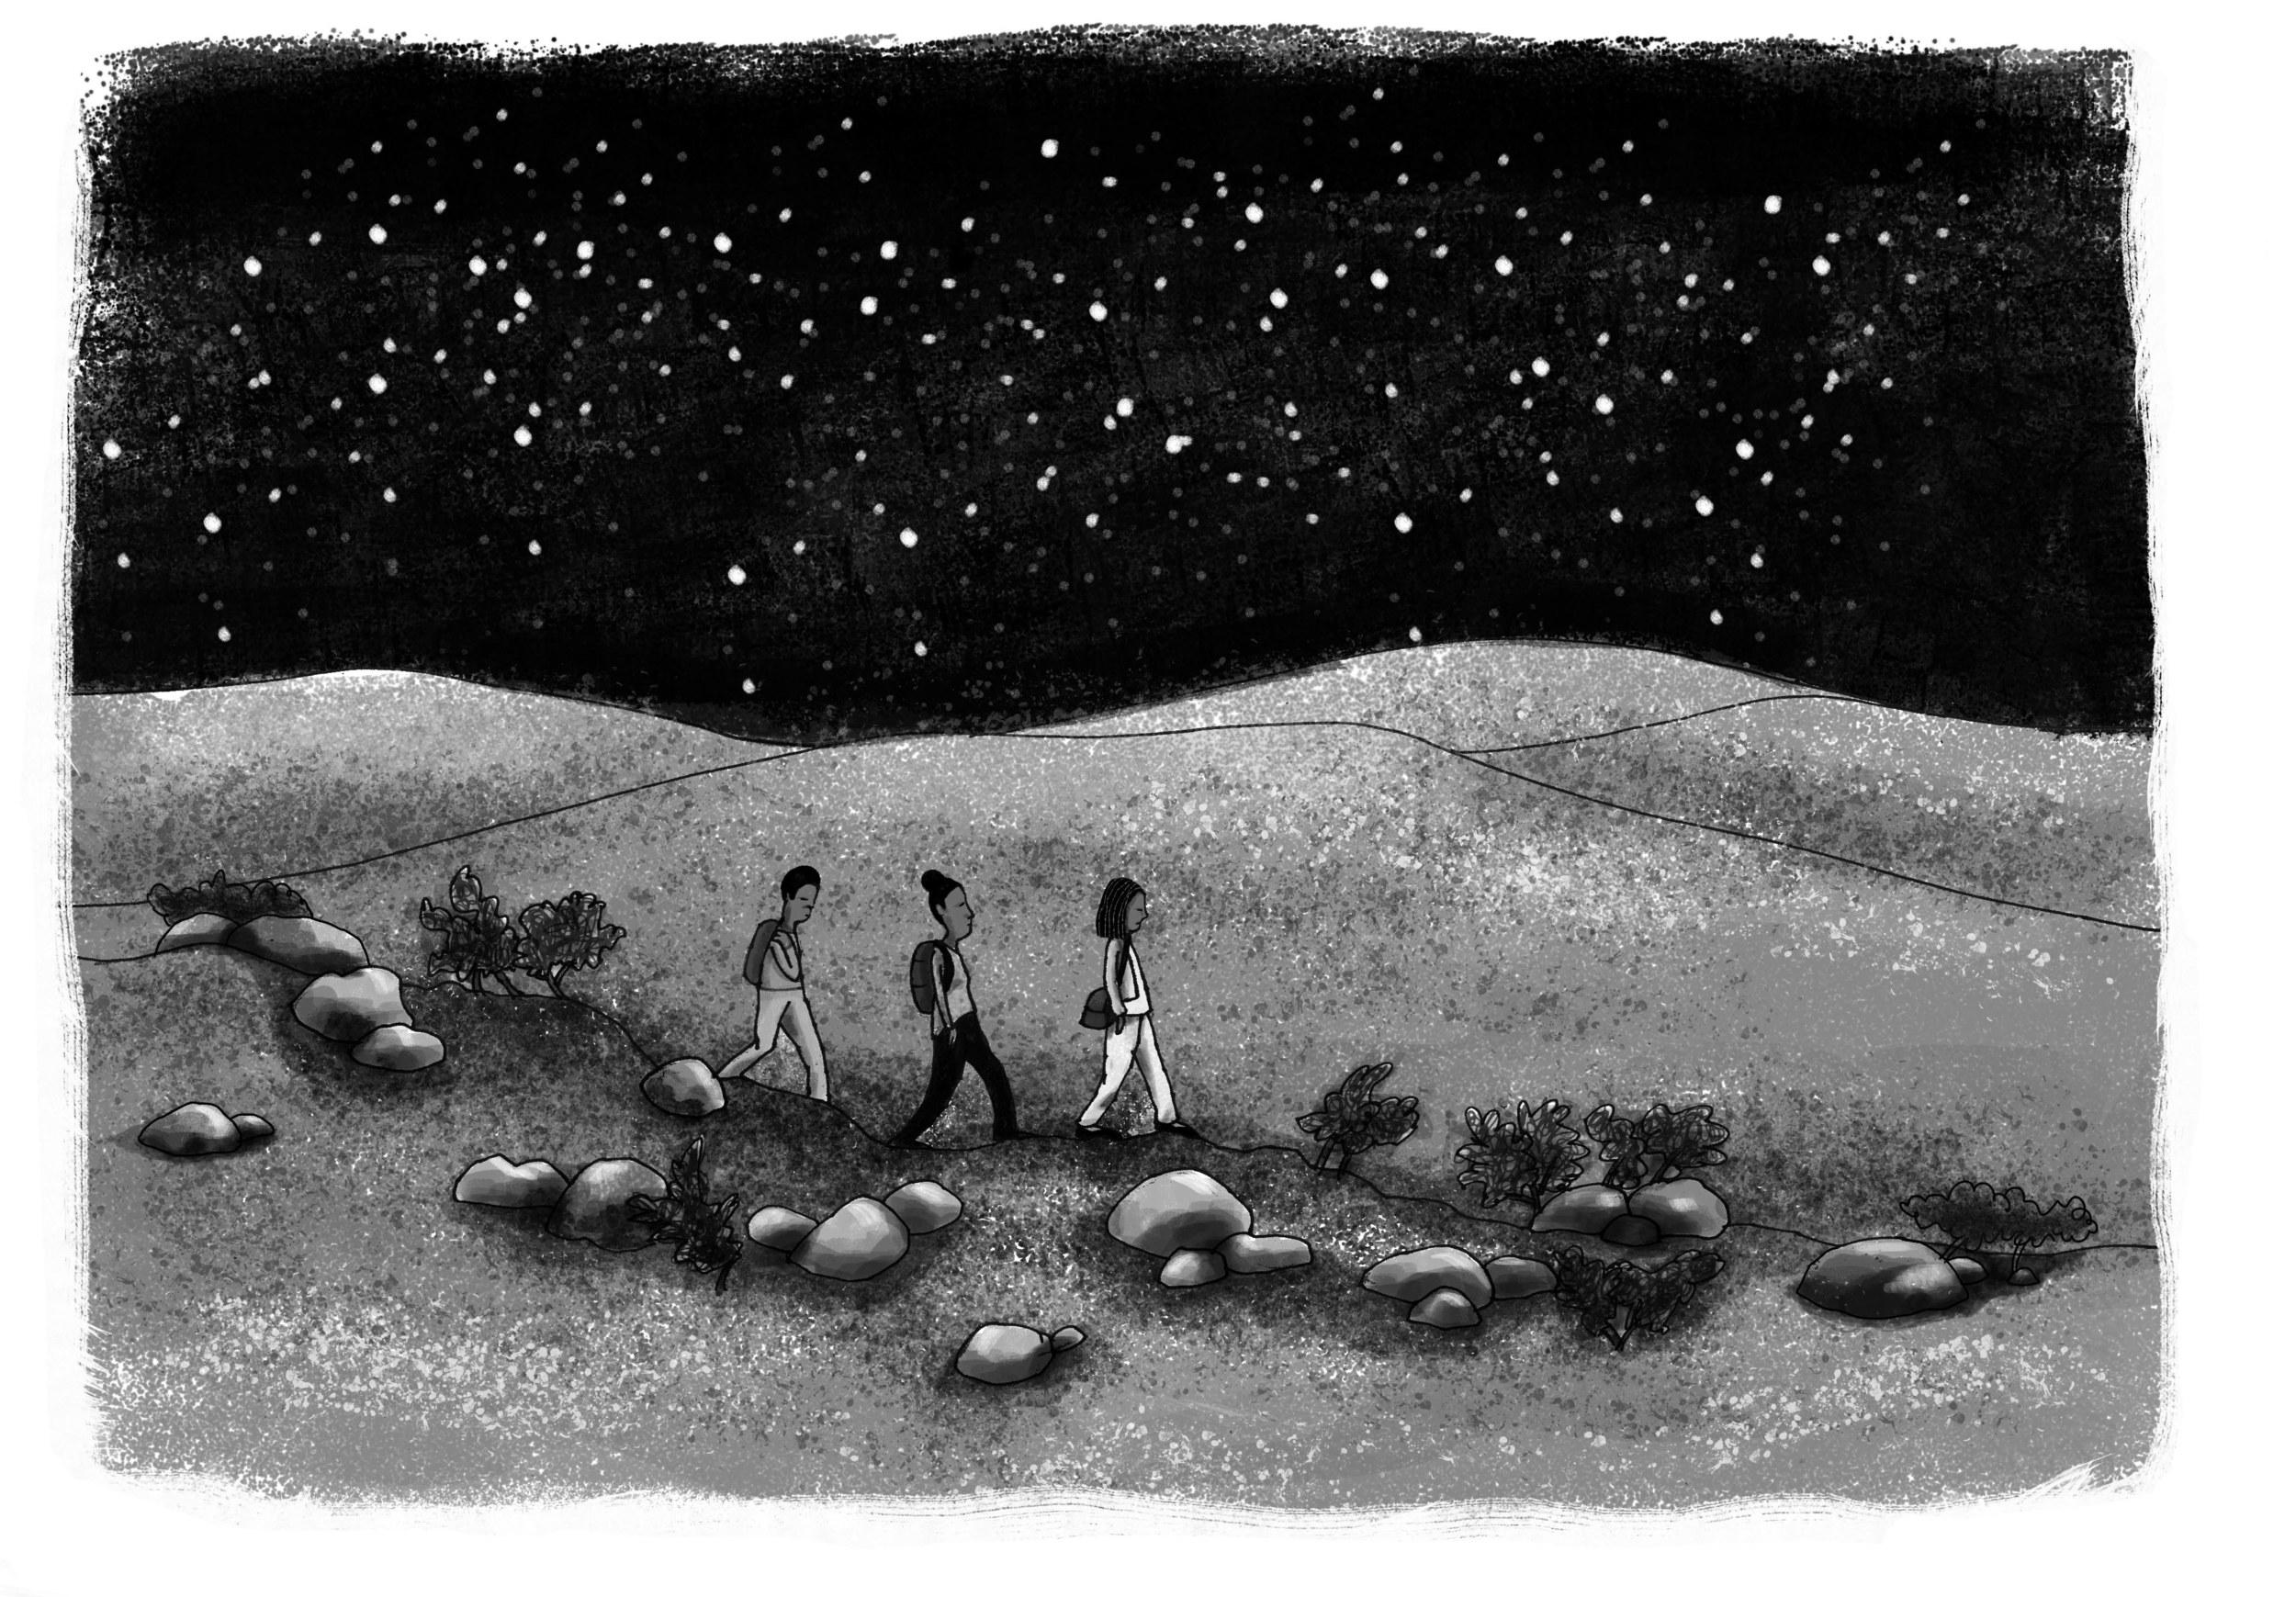 Walking through the desert.